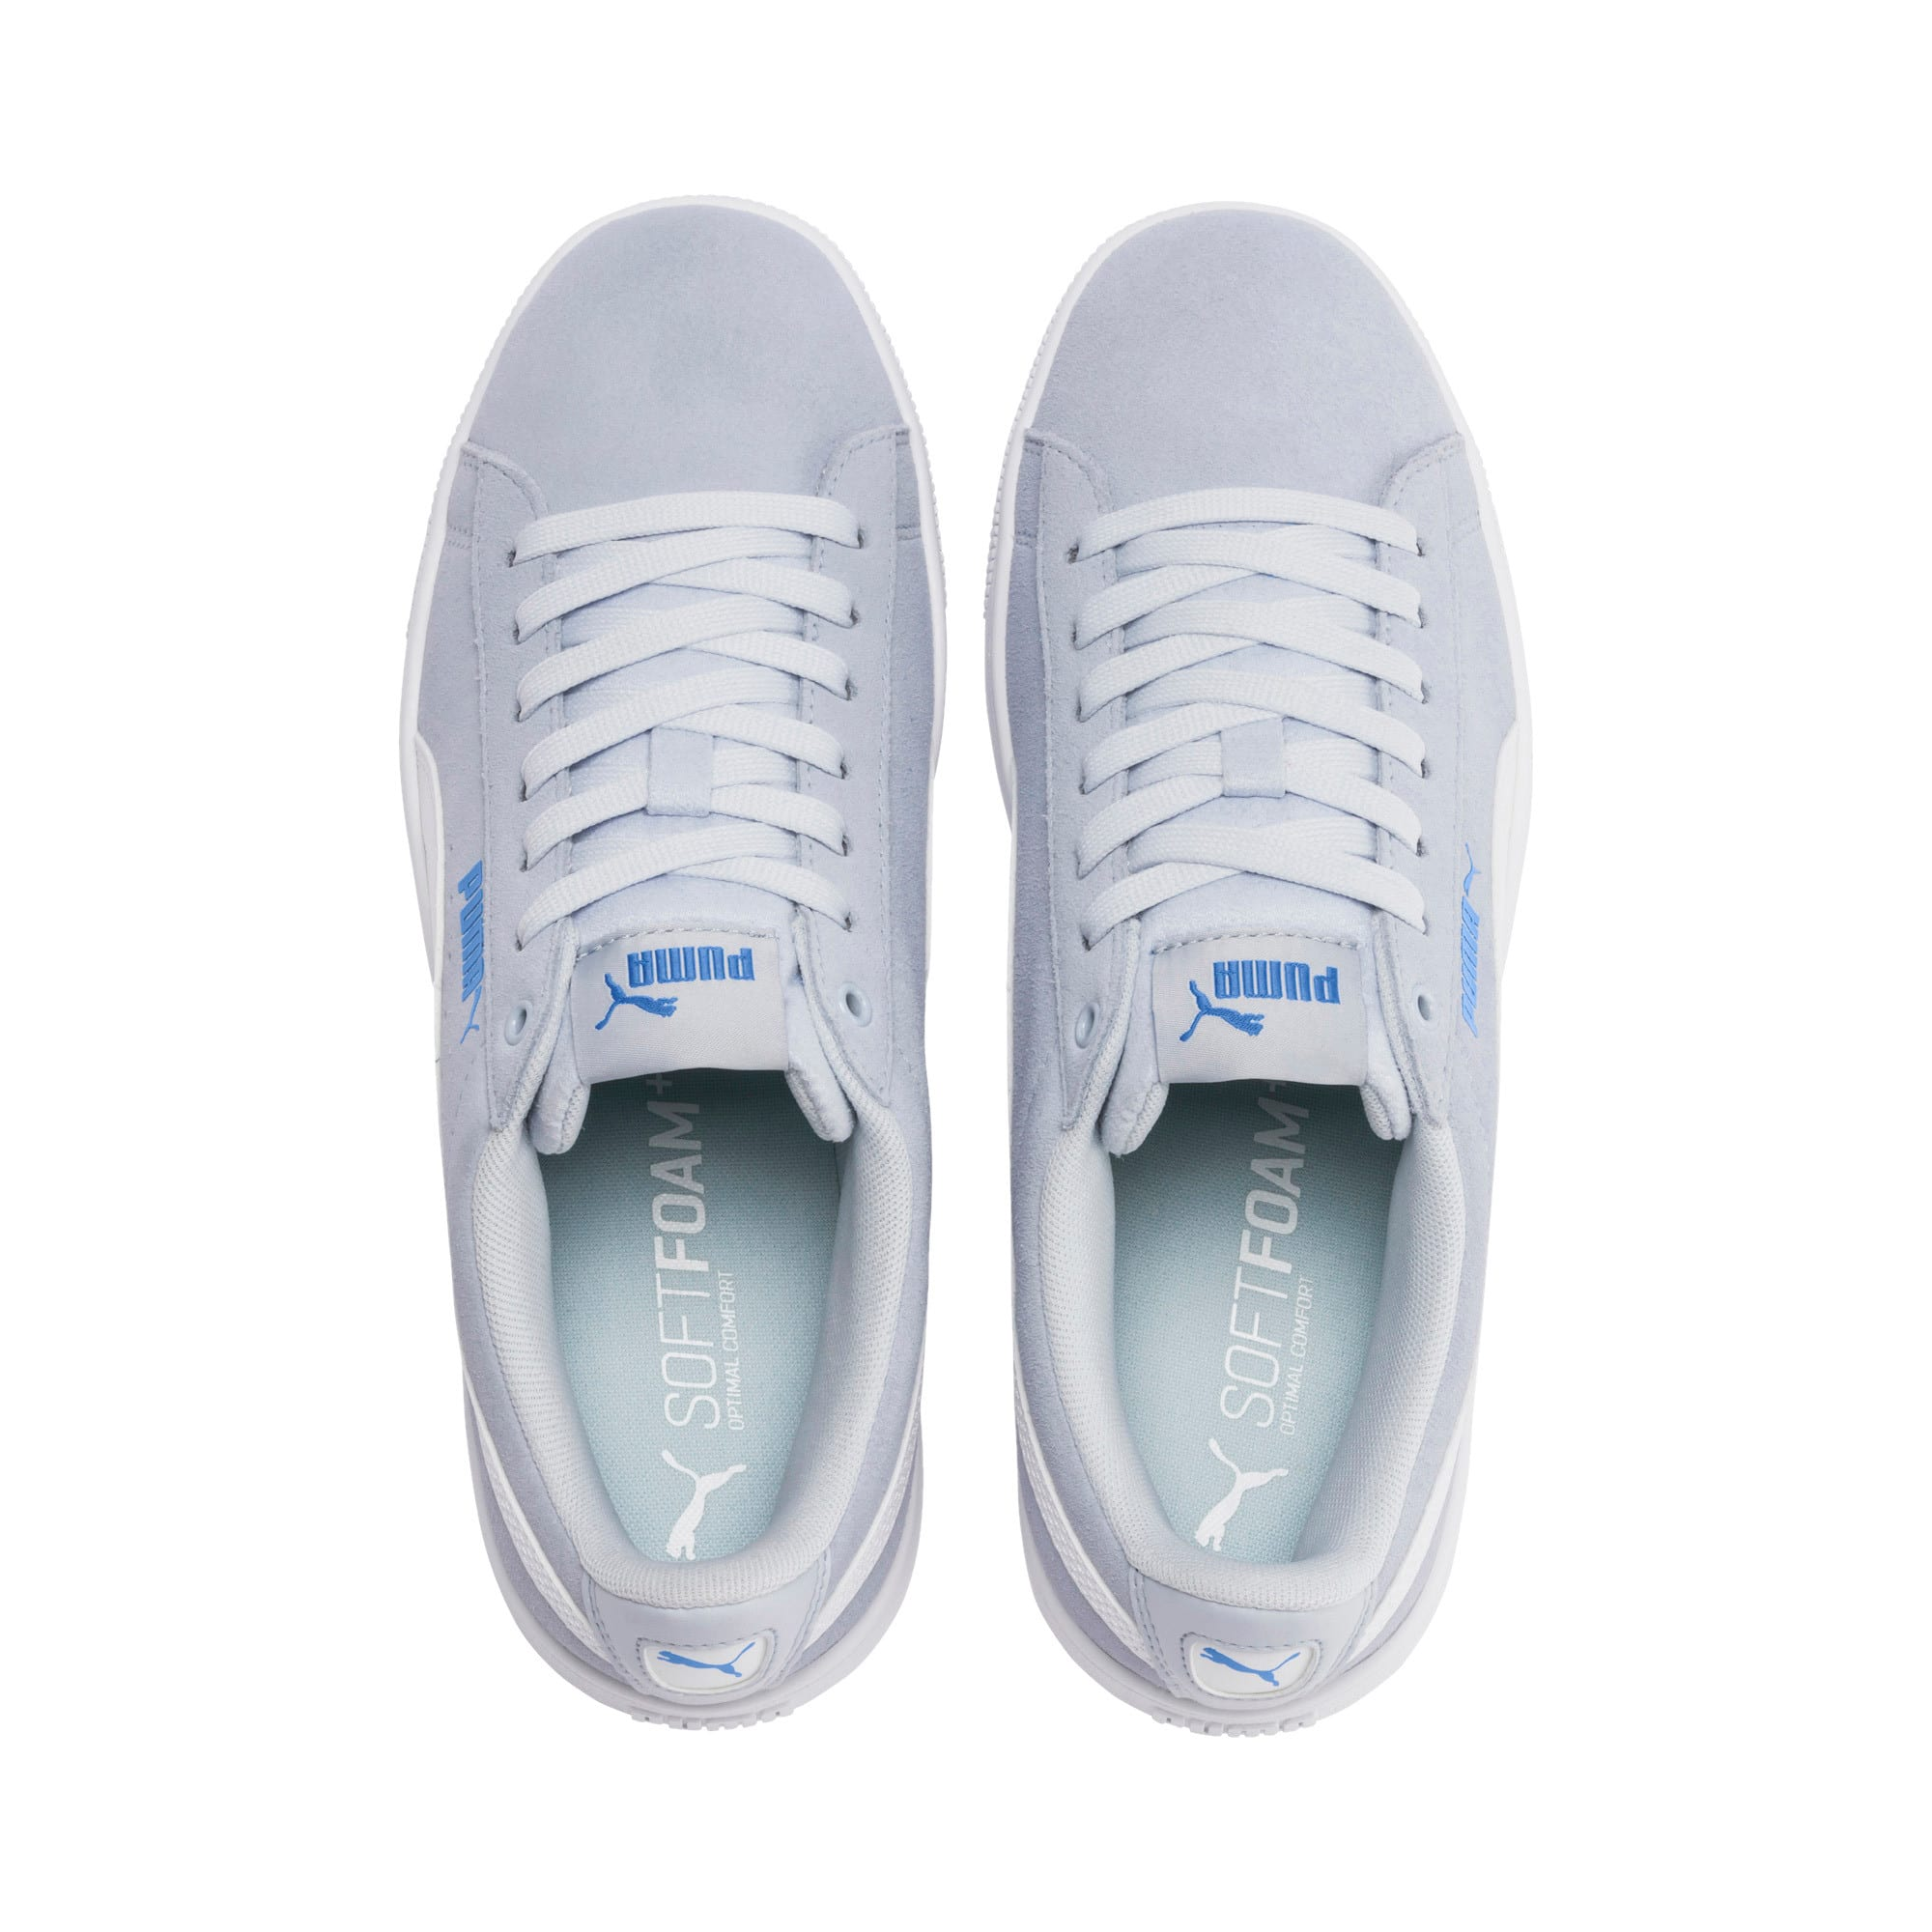 Thumbnail 7 of PUMA Vikky v2 Women's Sneakers, Heather-Ultramarine-White, medium